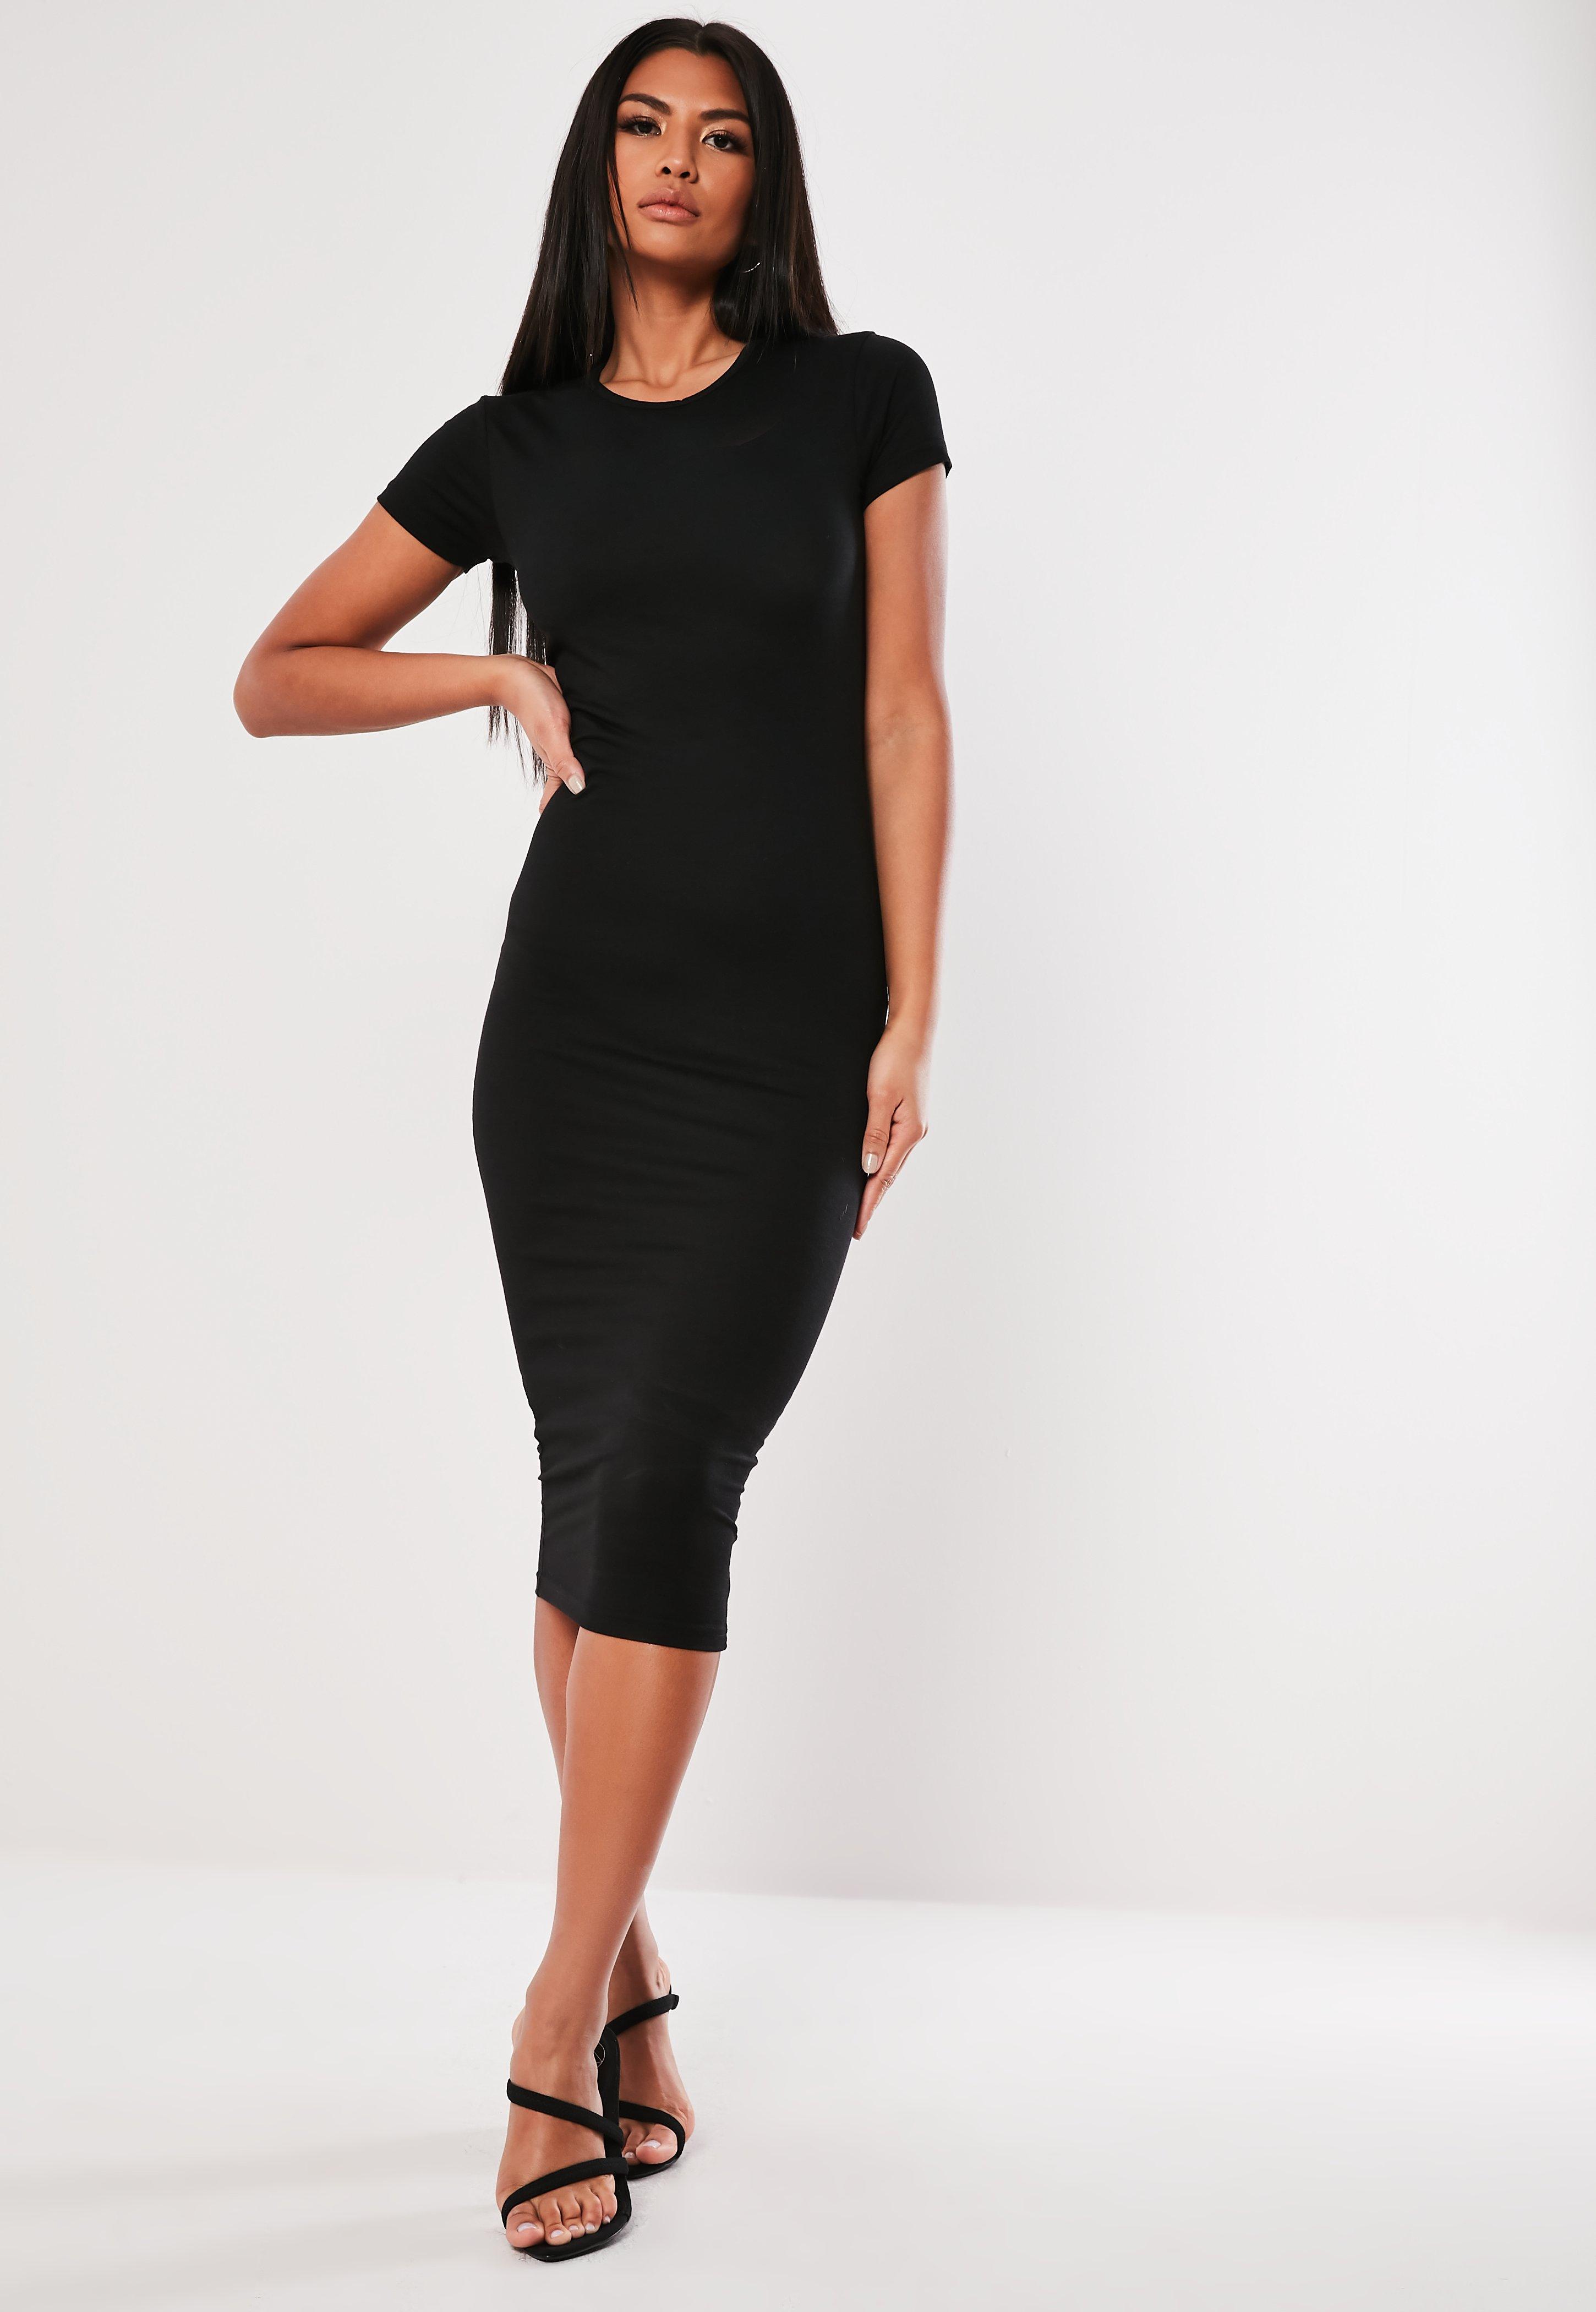 e28eda13d16b6 Sukienki Online | Damskie Sukienki Na Każdą Okazję - Missguided PL